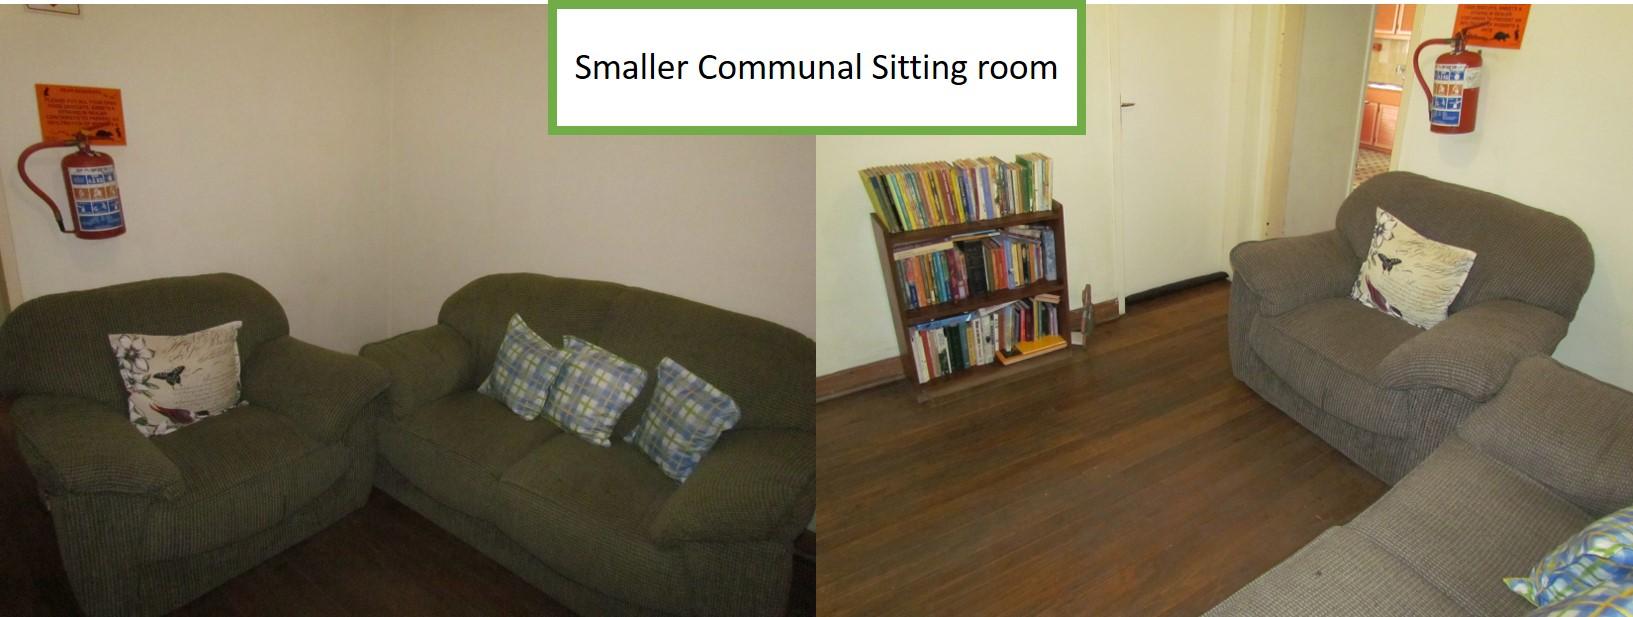 Smaller communal Sitting Room